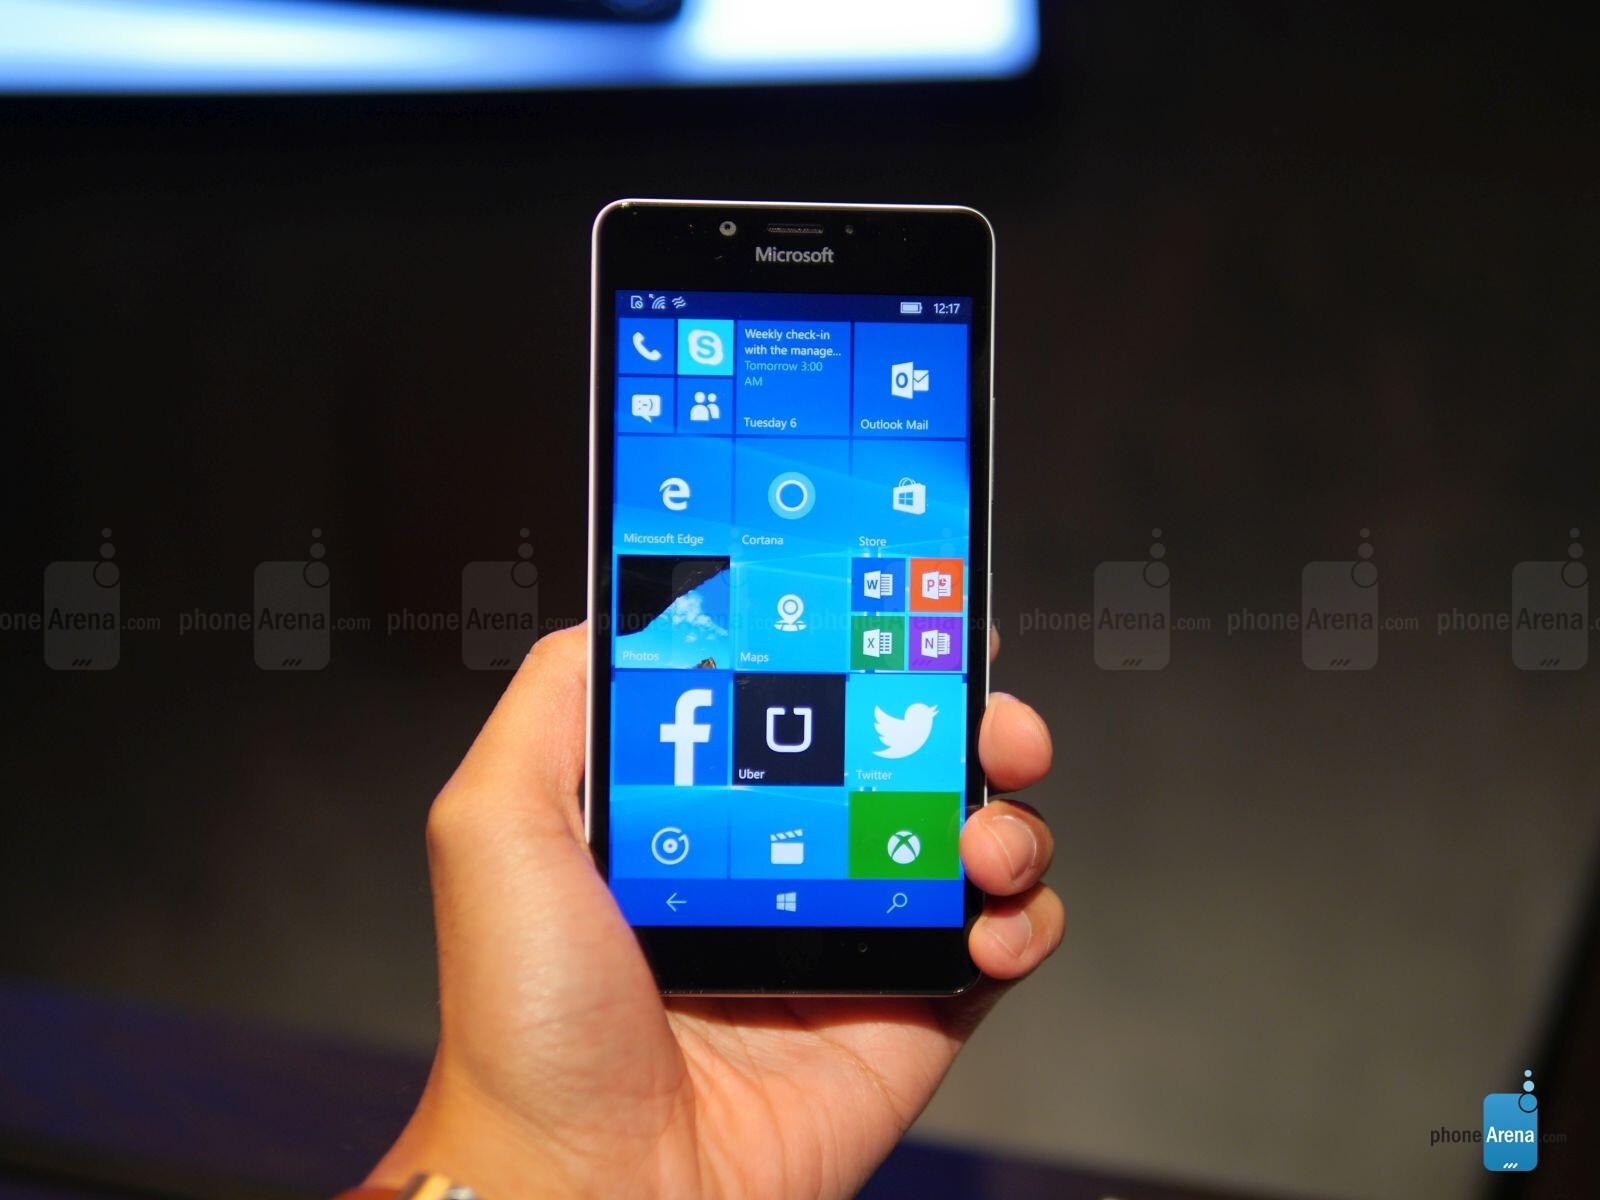 Smartphones with Quad HD (1440 x 2560) resolution displays (2015